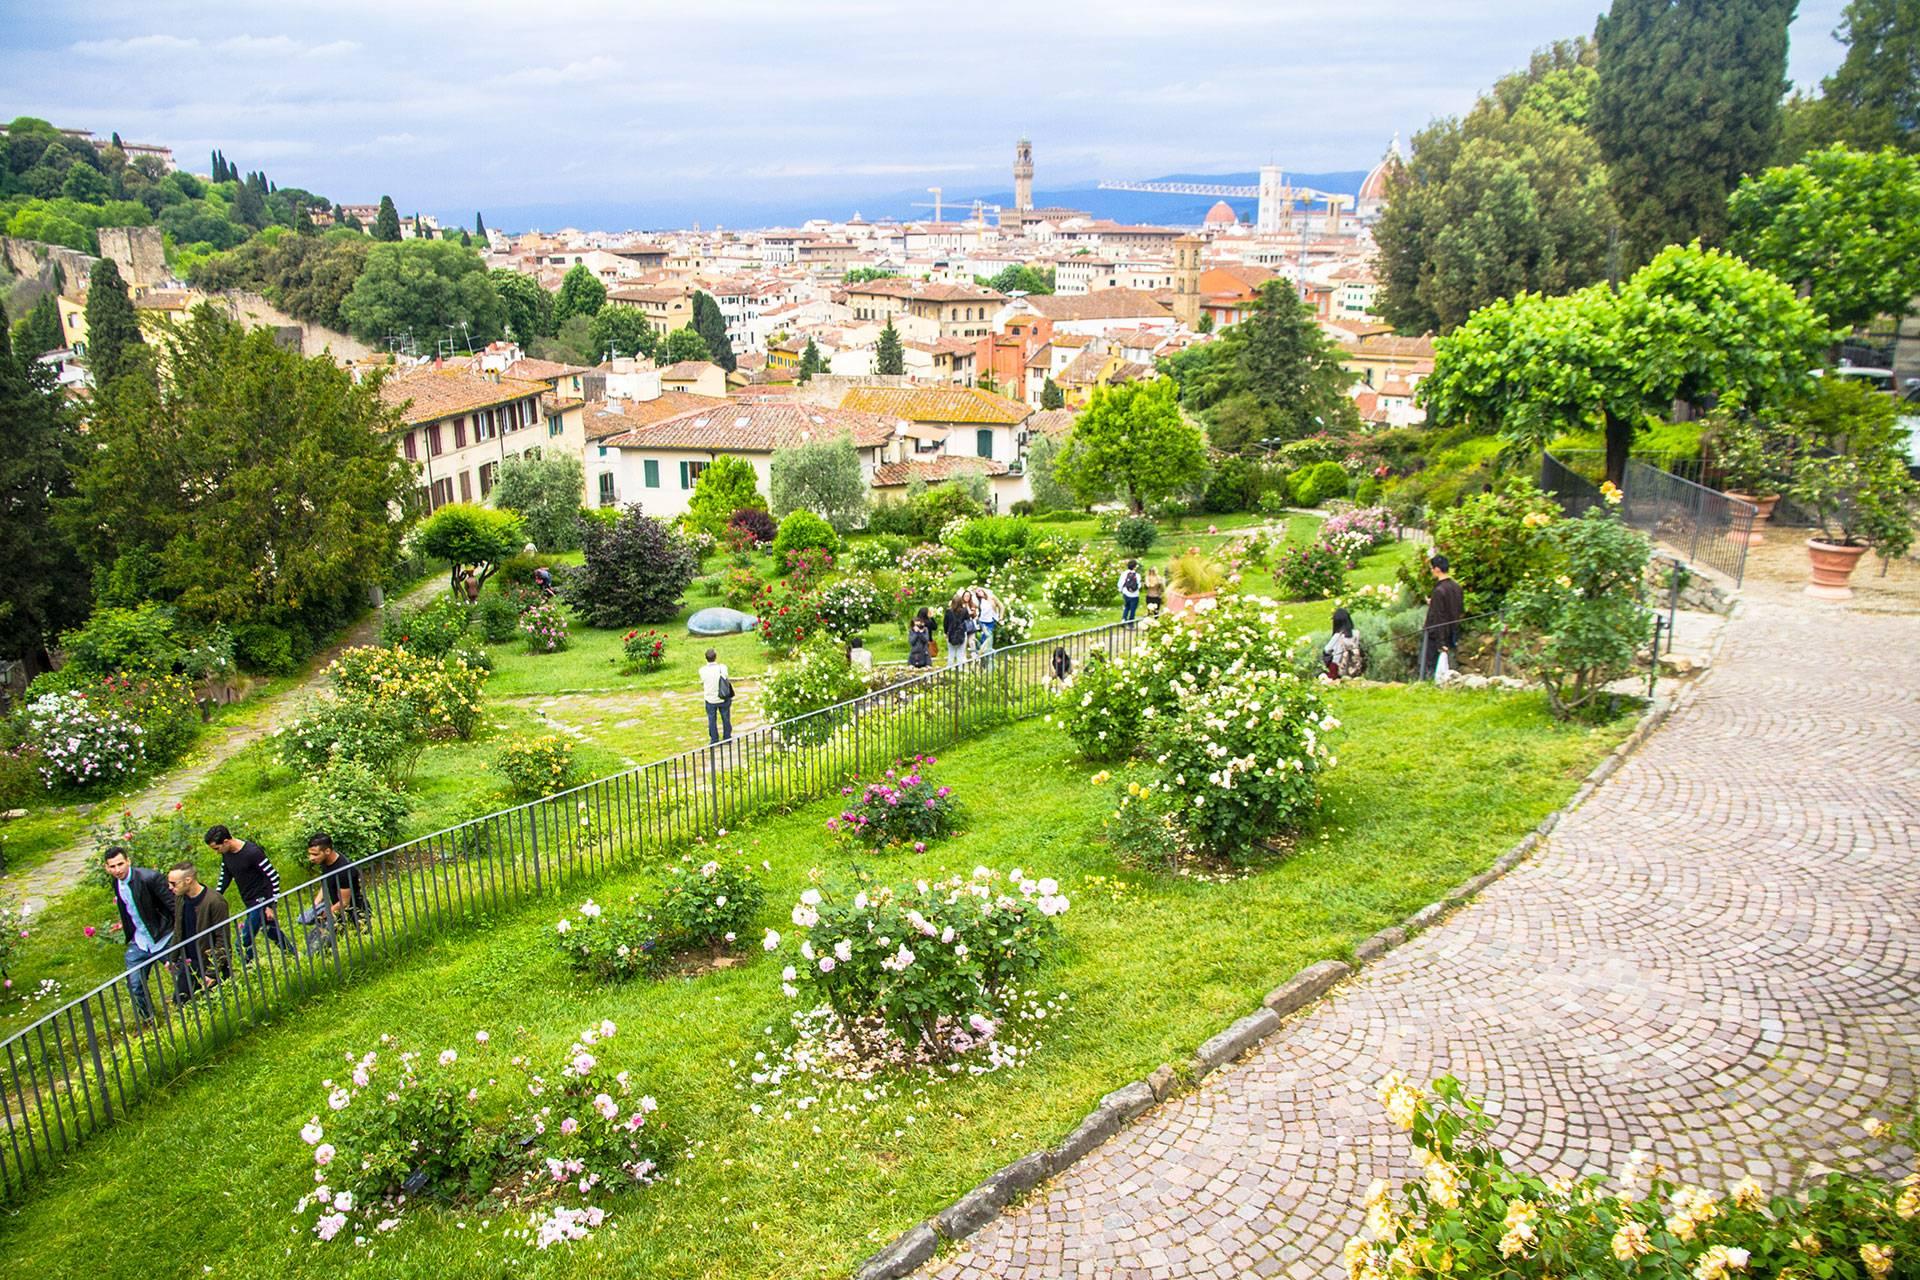 Photo 2: Florence - Le jardin des roses